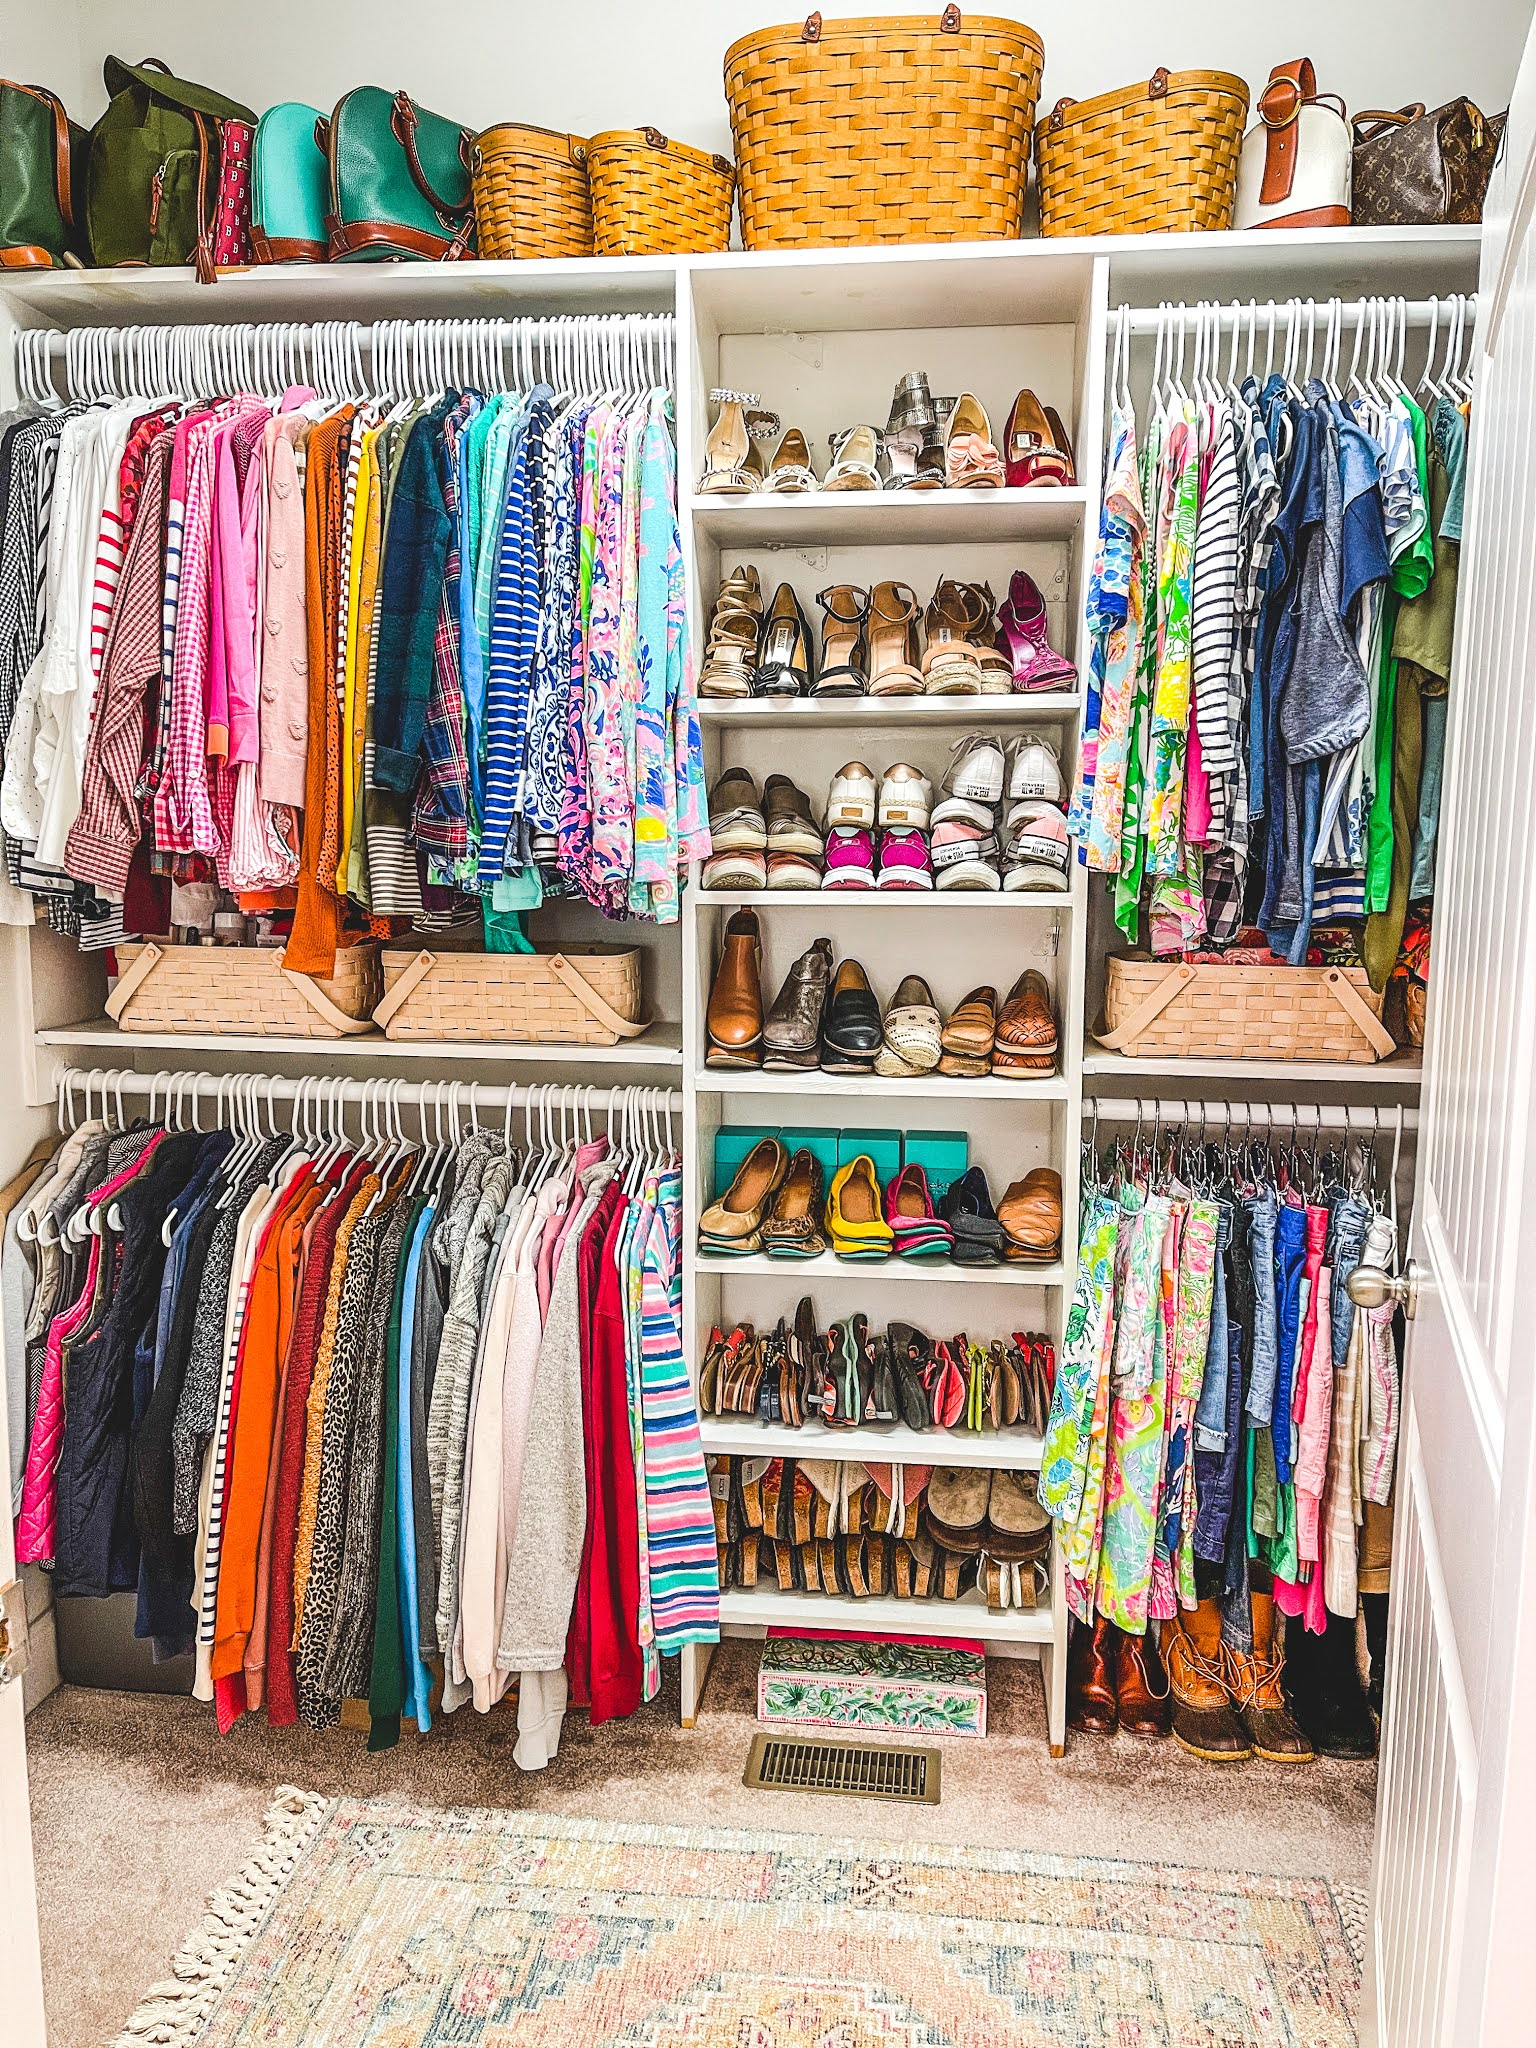 Shaw Avenue | Master Bedroom Closet Makeover & Closet Capsule Wardrobe